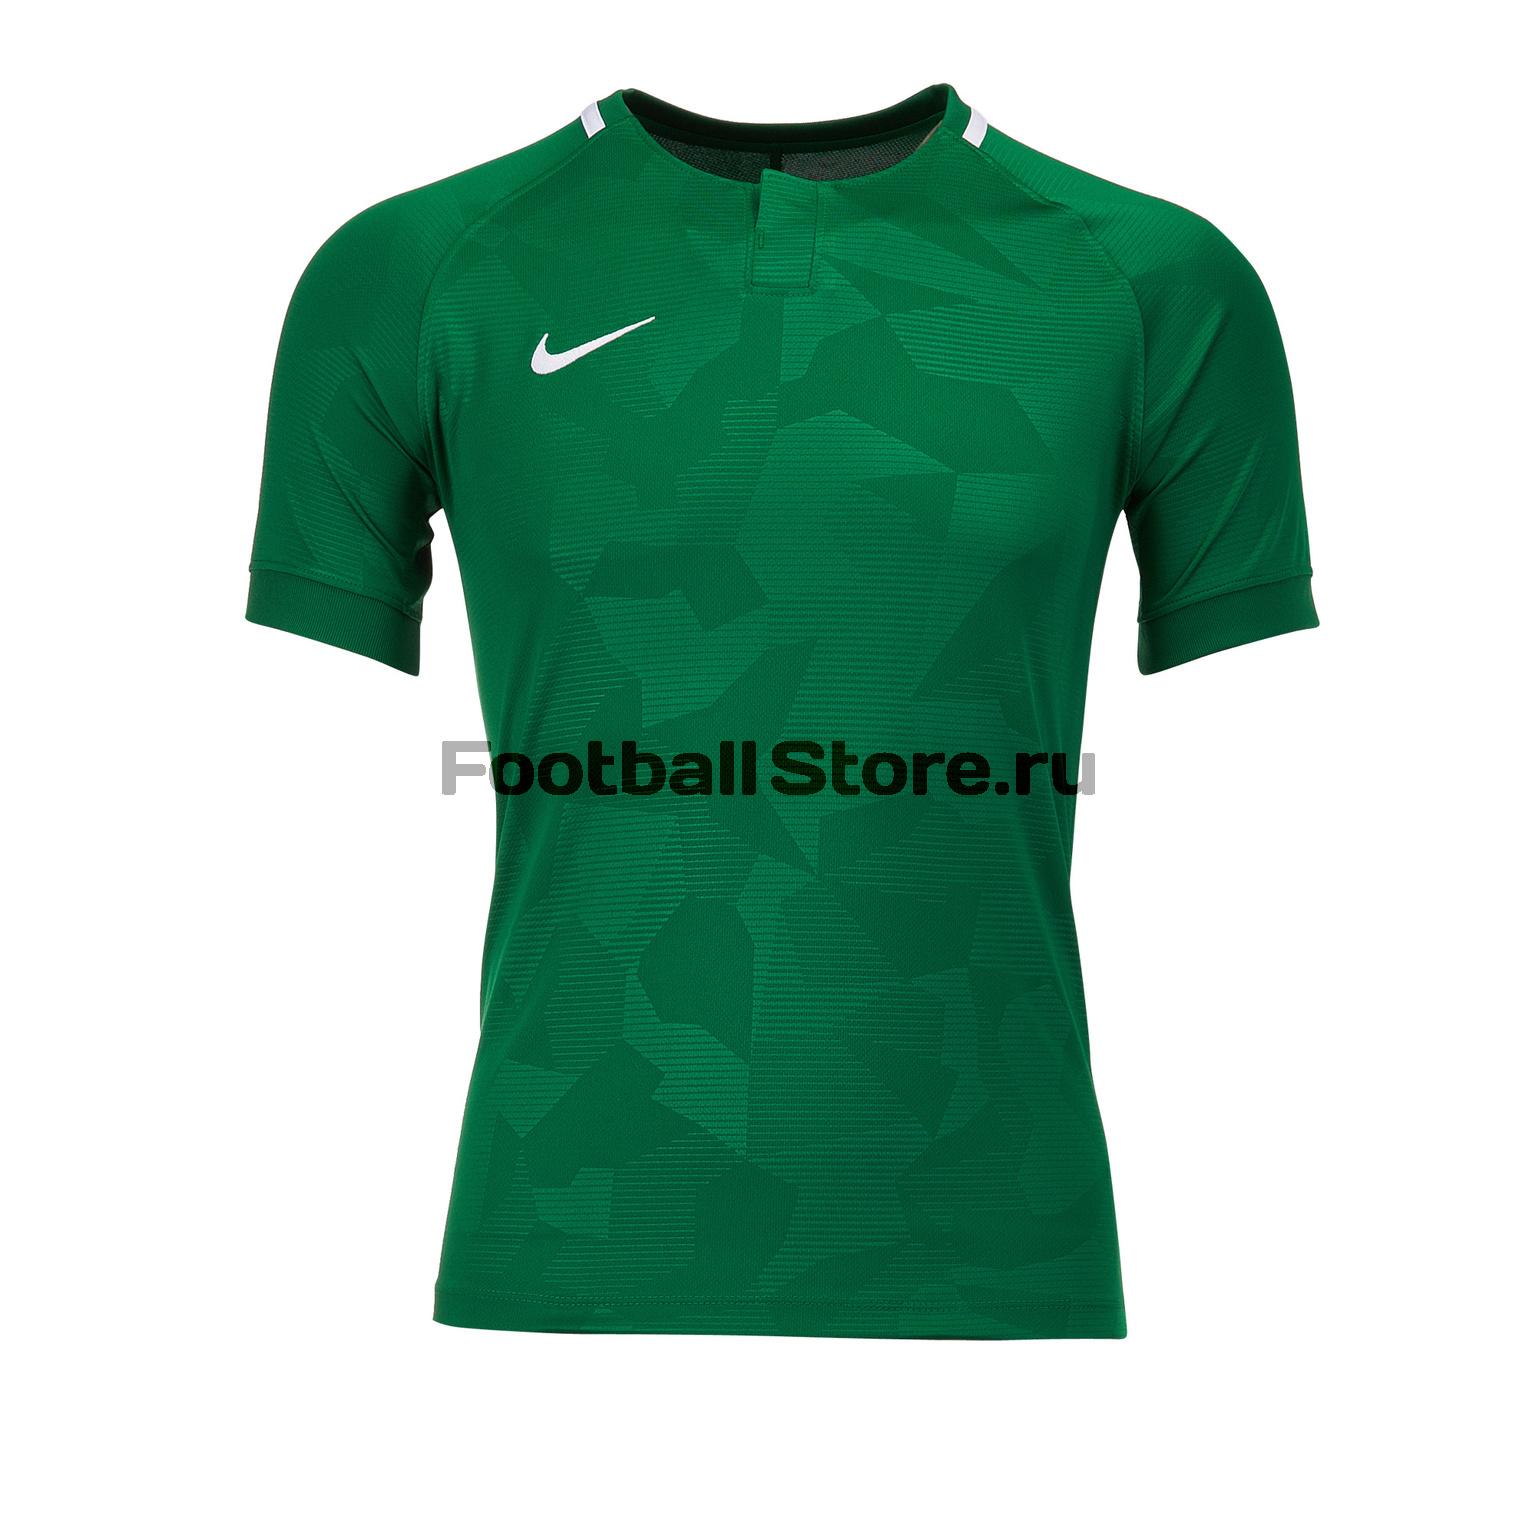 Футболка игровая детская Nike Dry Challenge II 894053-341 нижнее белье nike 654876 341 pro combat